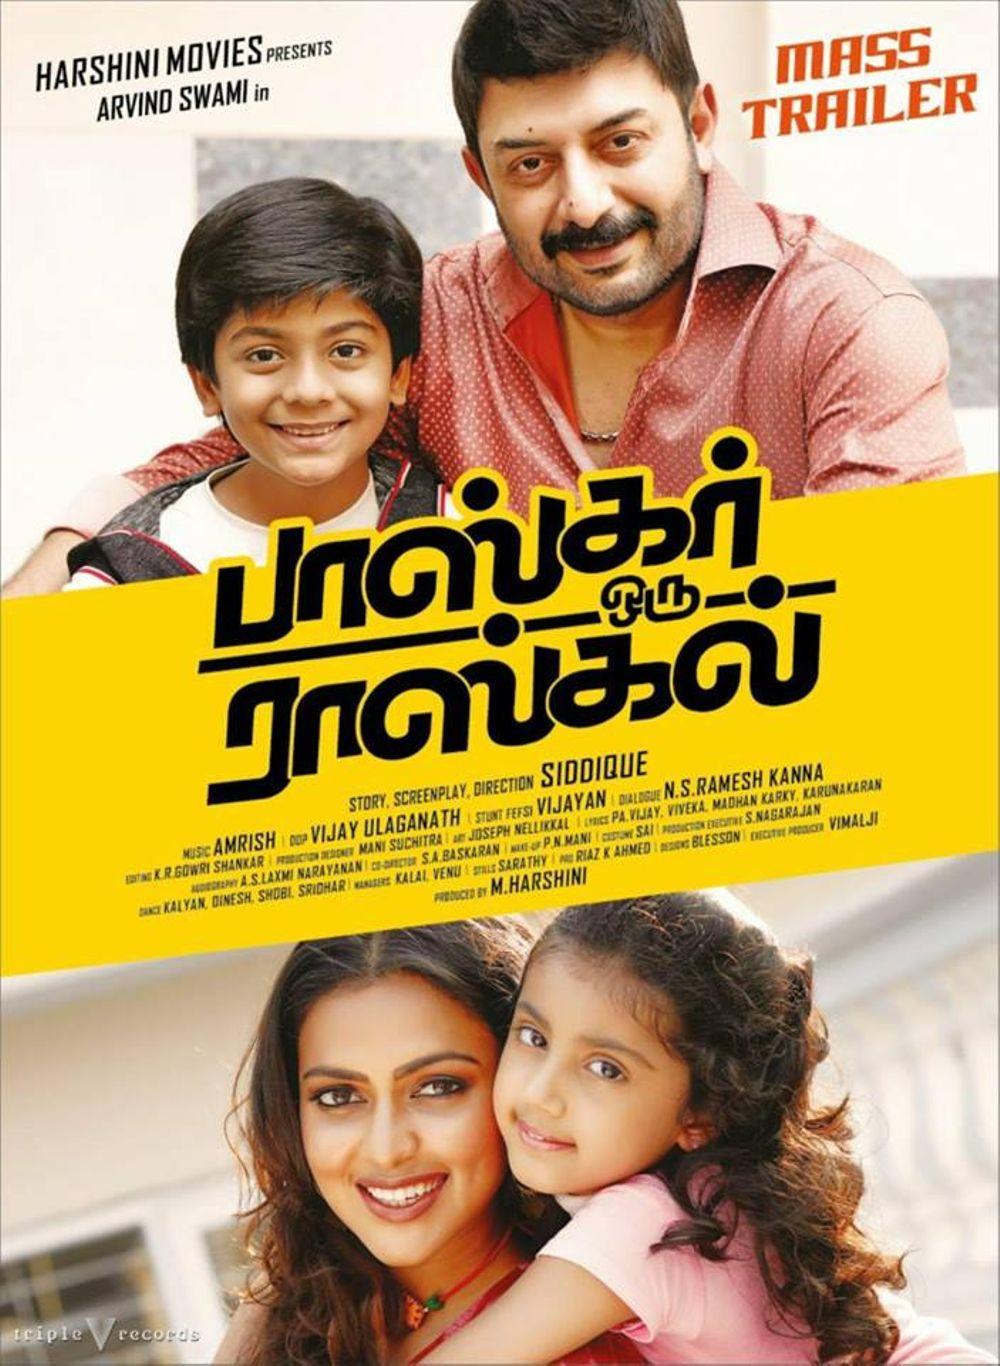 Bhaskar Oru Rascal Movie Hd Poster Wallpaper First Look Free